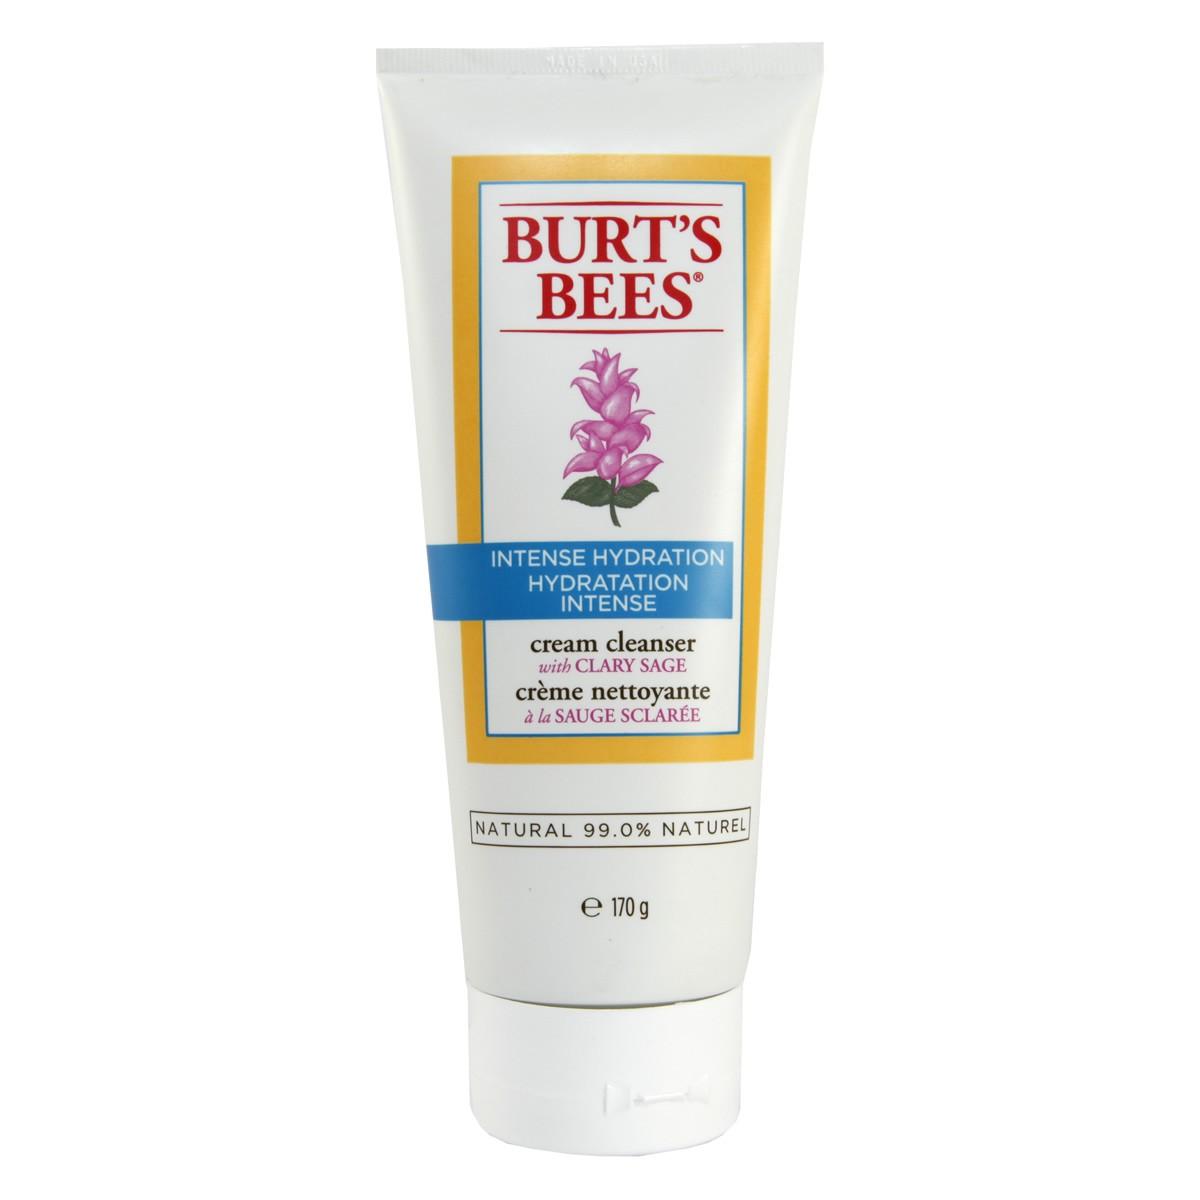 Burt`s Bees Intense Hydration Cream Cleanser